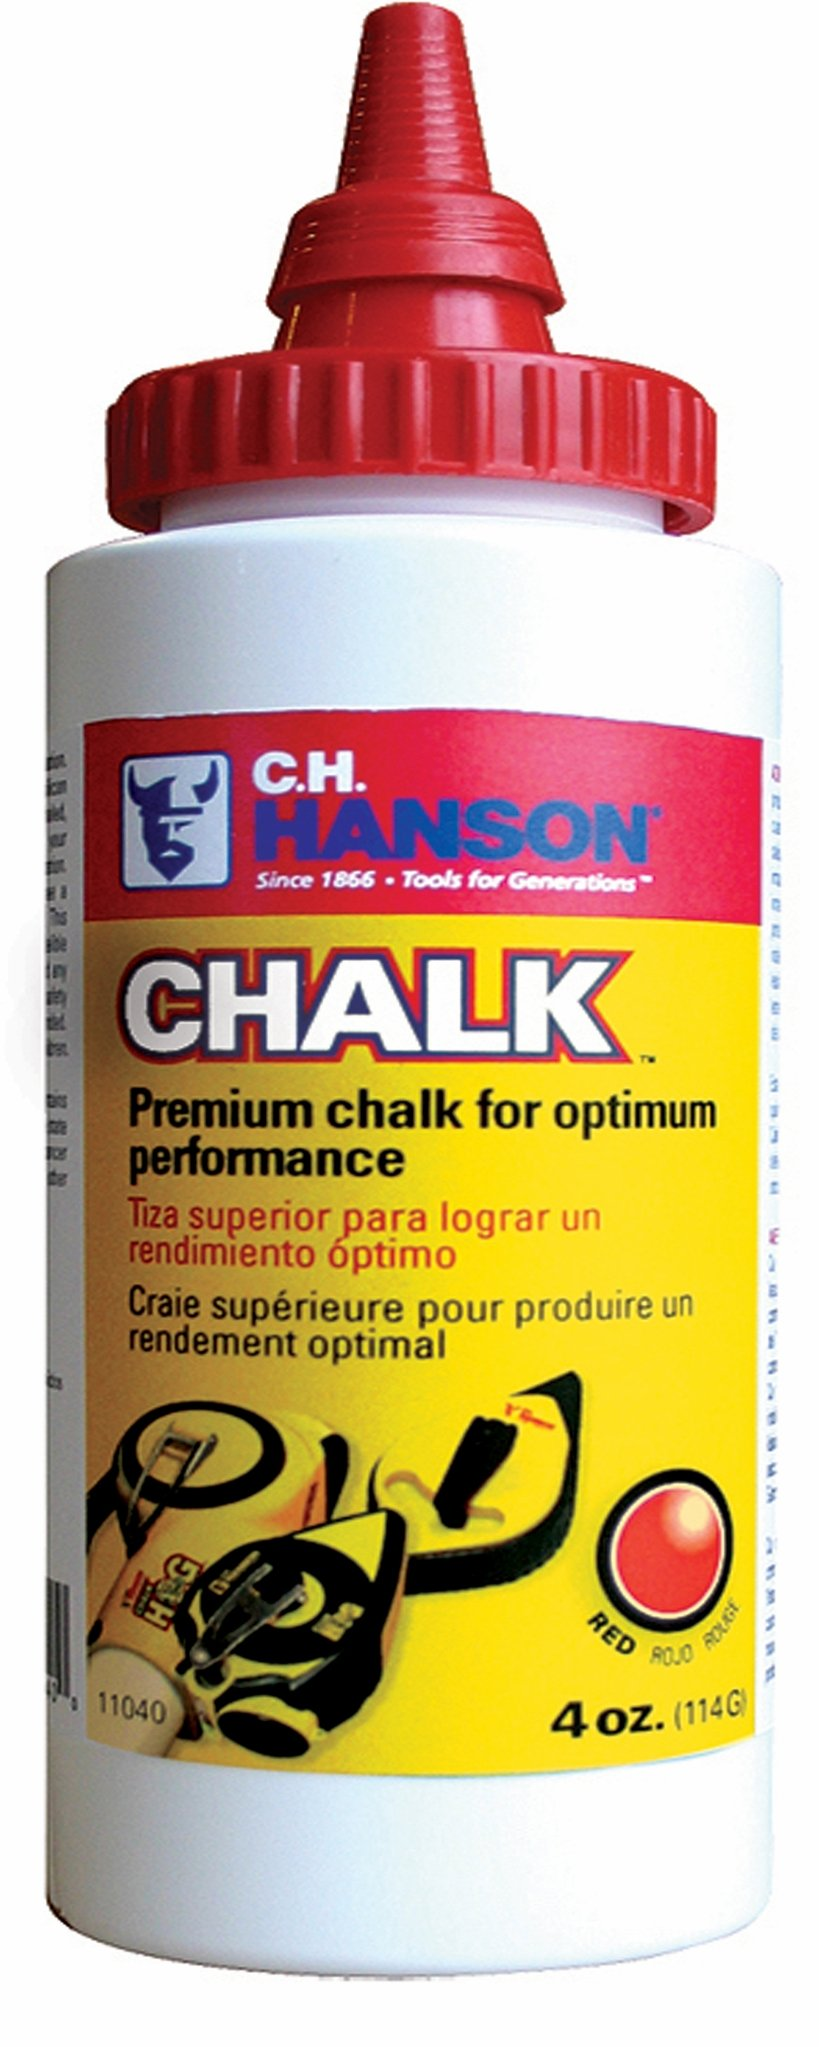 CH Hanson 11041 White 4 oz. Chalk refill